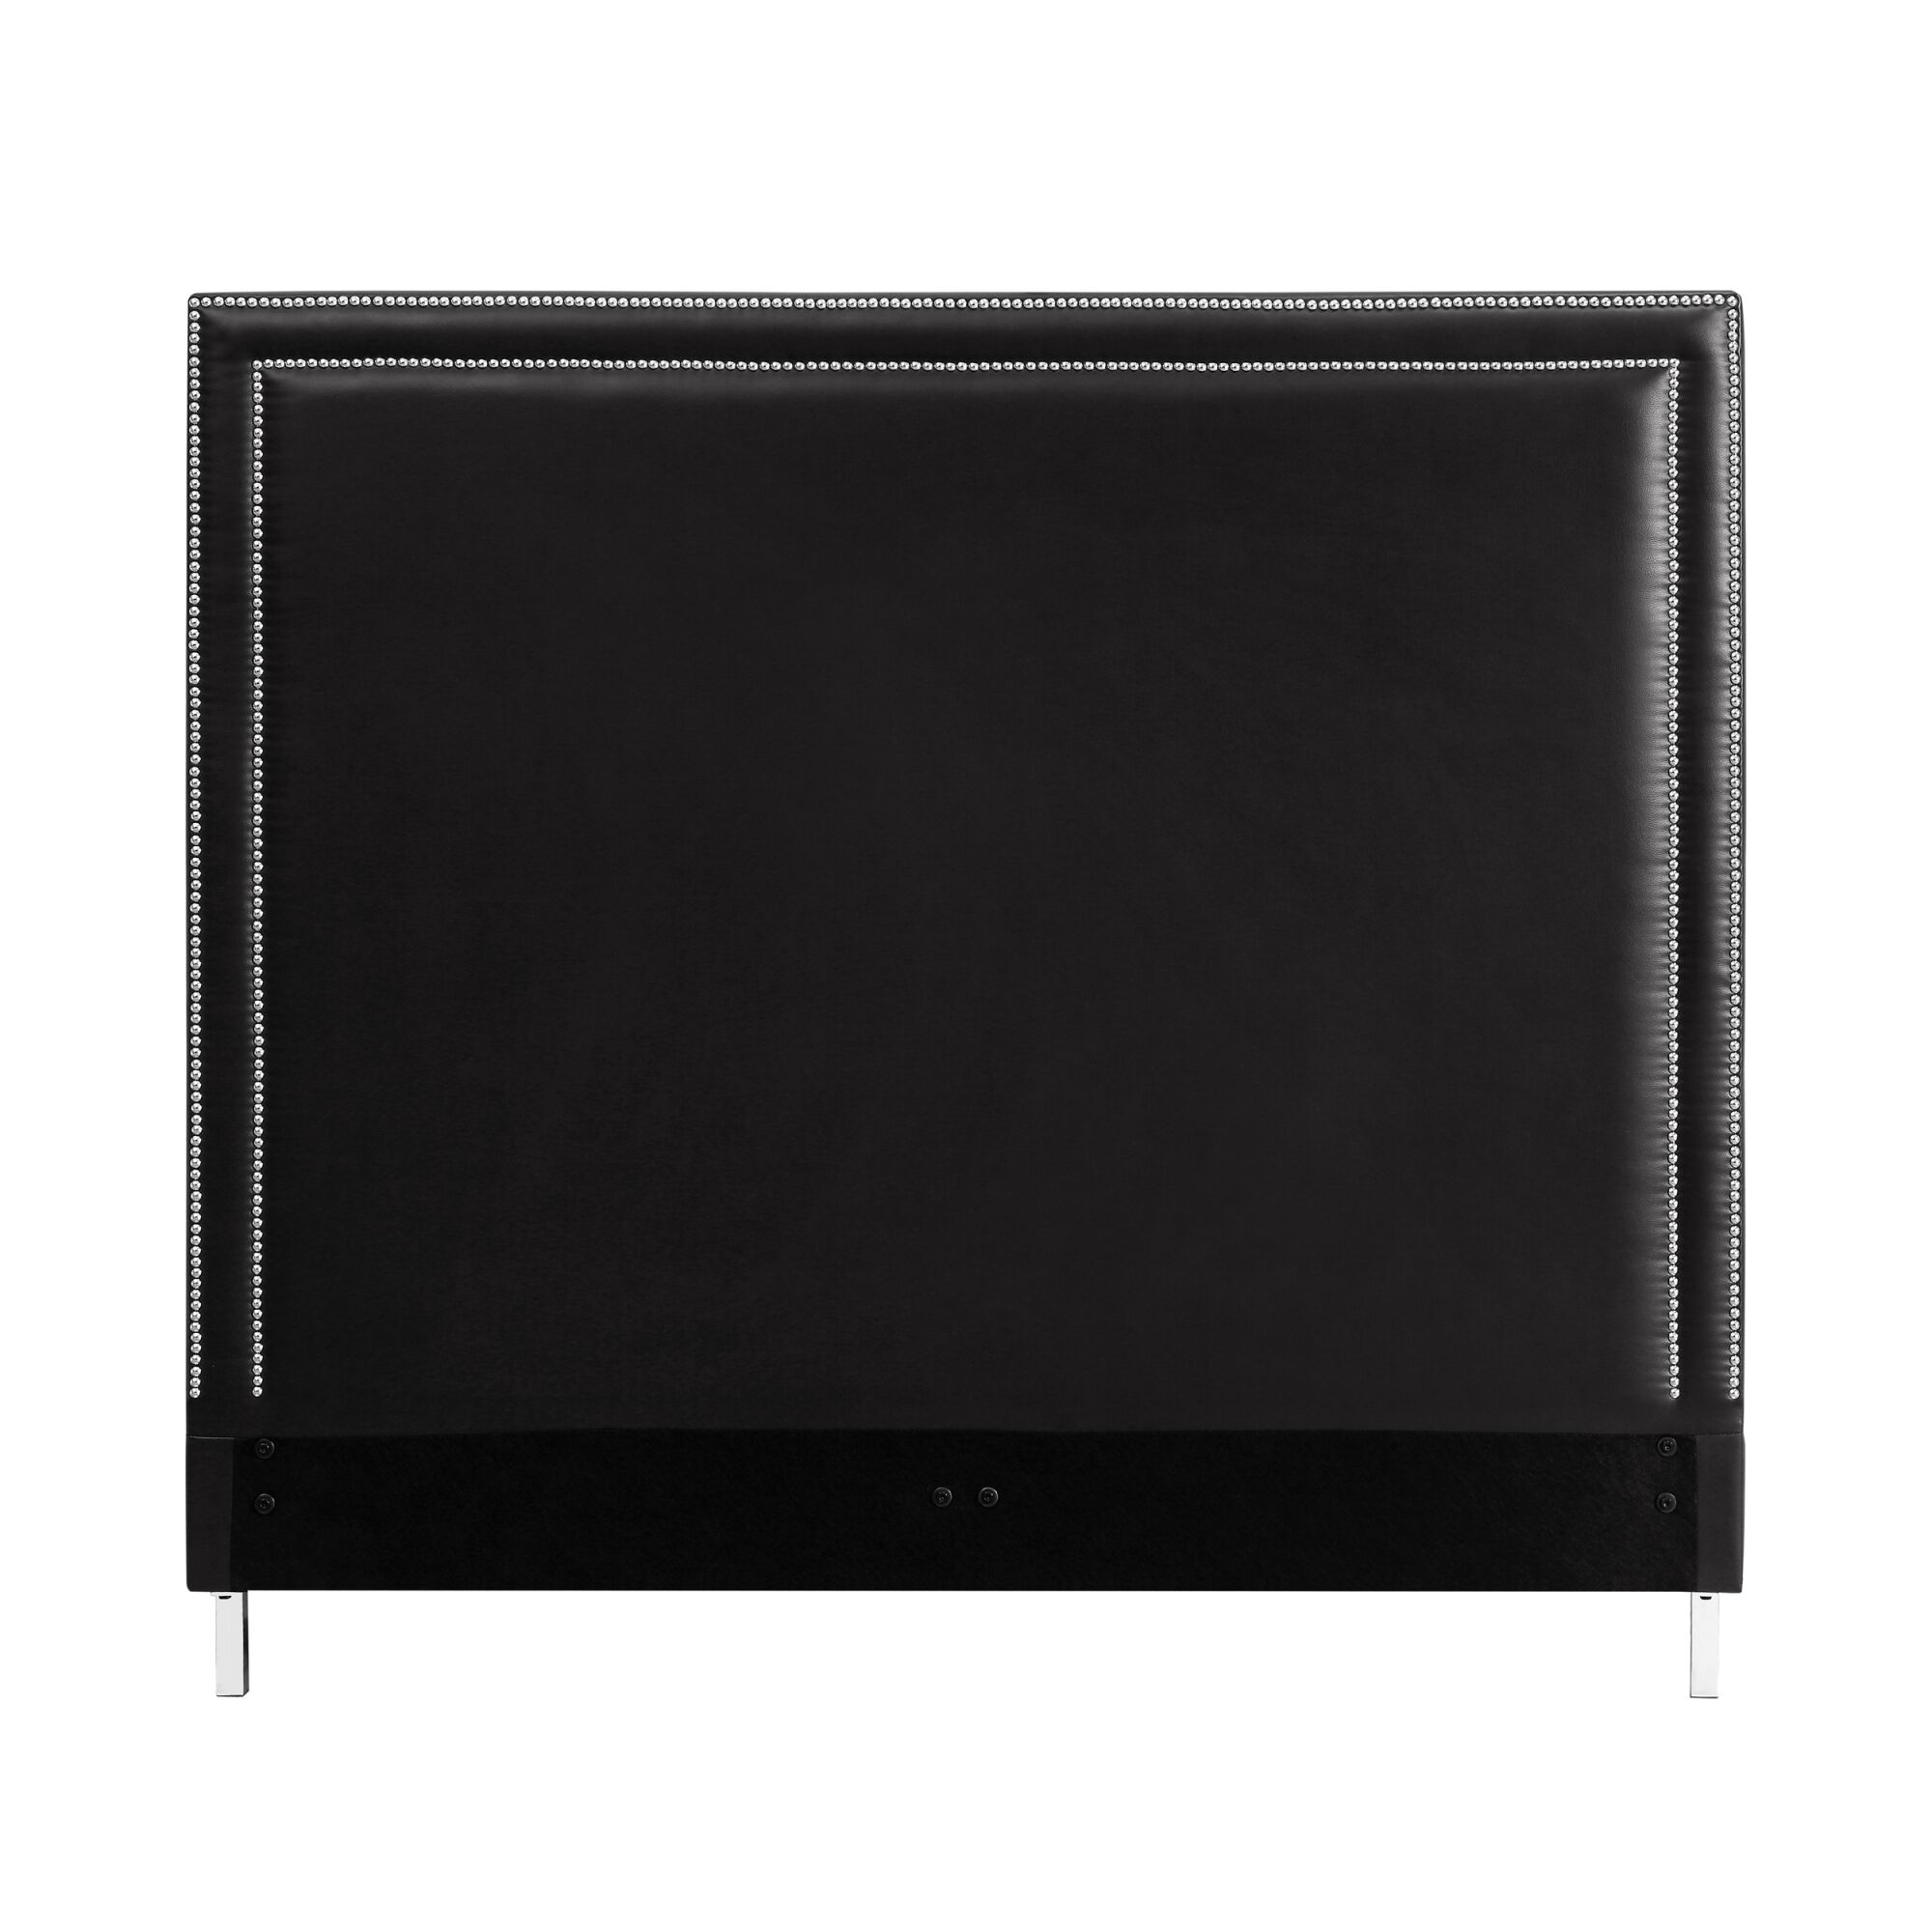 Dahms Nailhead Trim Upholstered Panel Headboard Upholstery: Black, Size: Queen